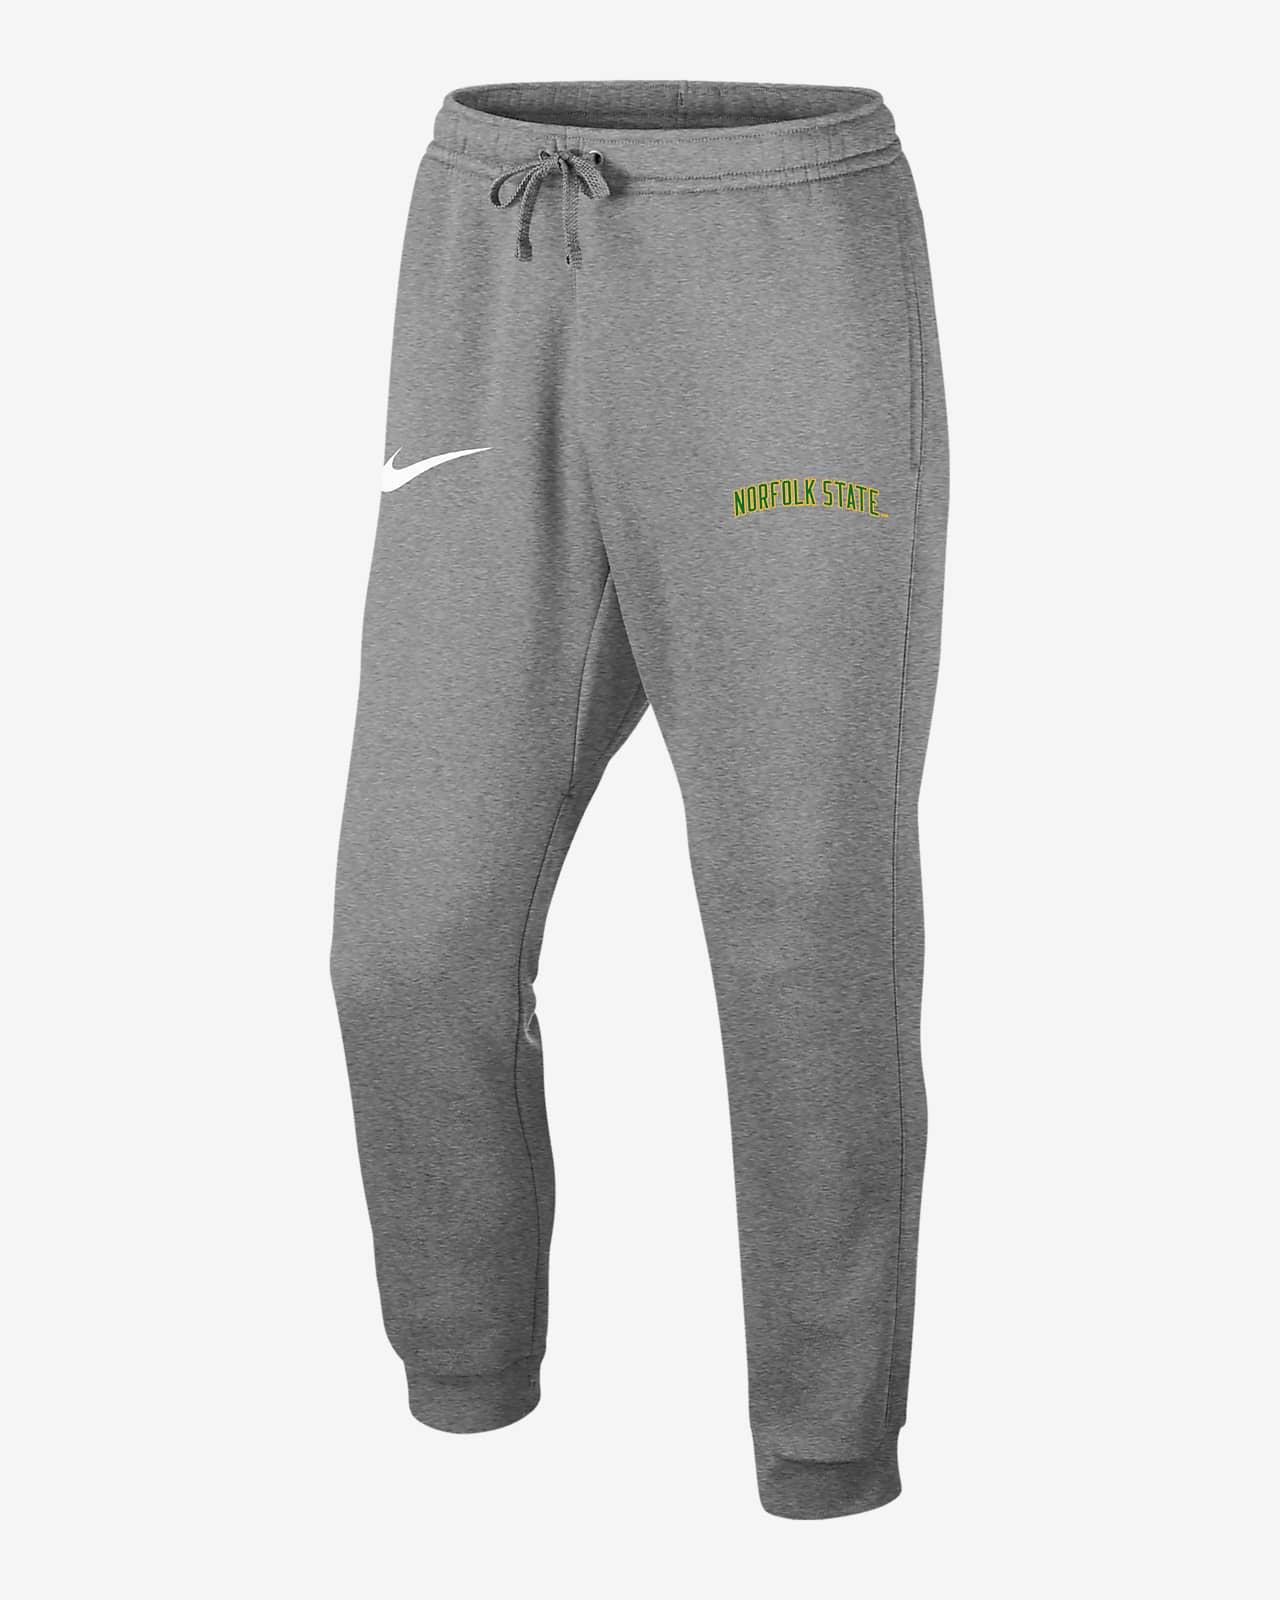 Nike College Club Fleece (Norfolk State) Joggers